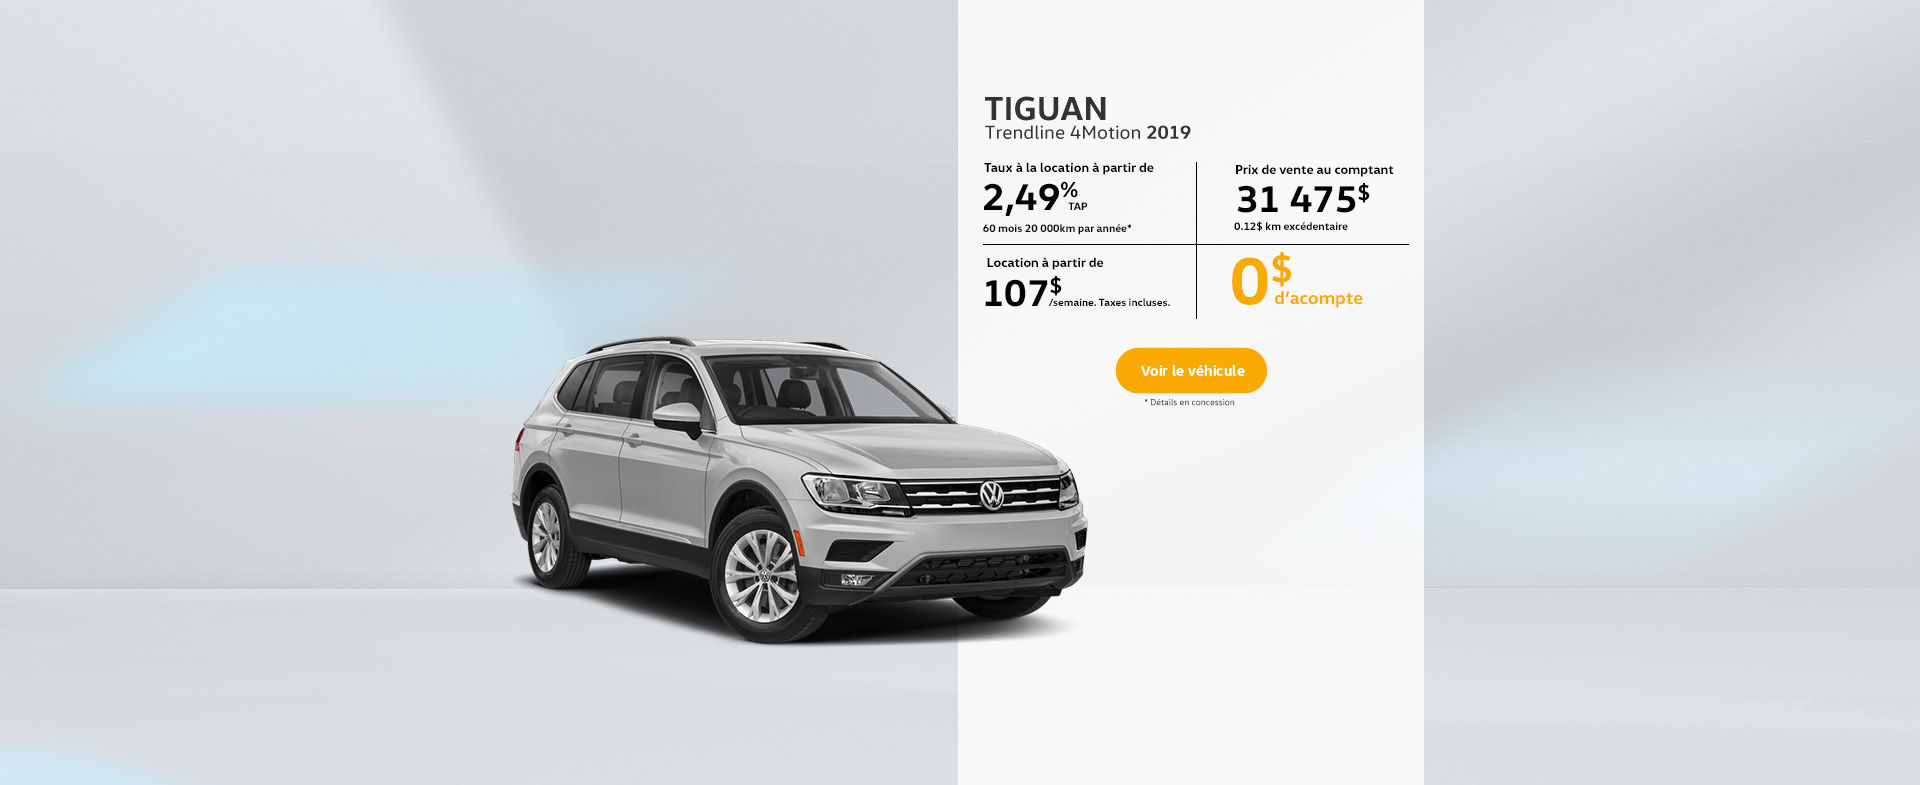 Tiguan Trendline 4Motion 2019